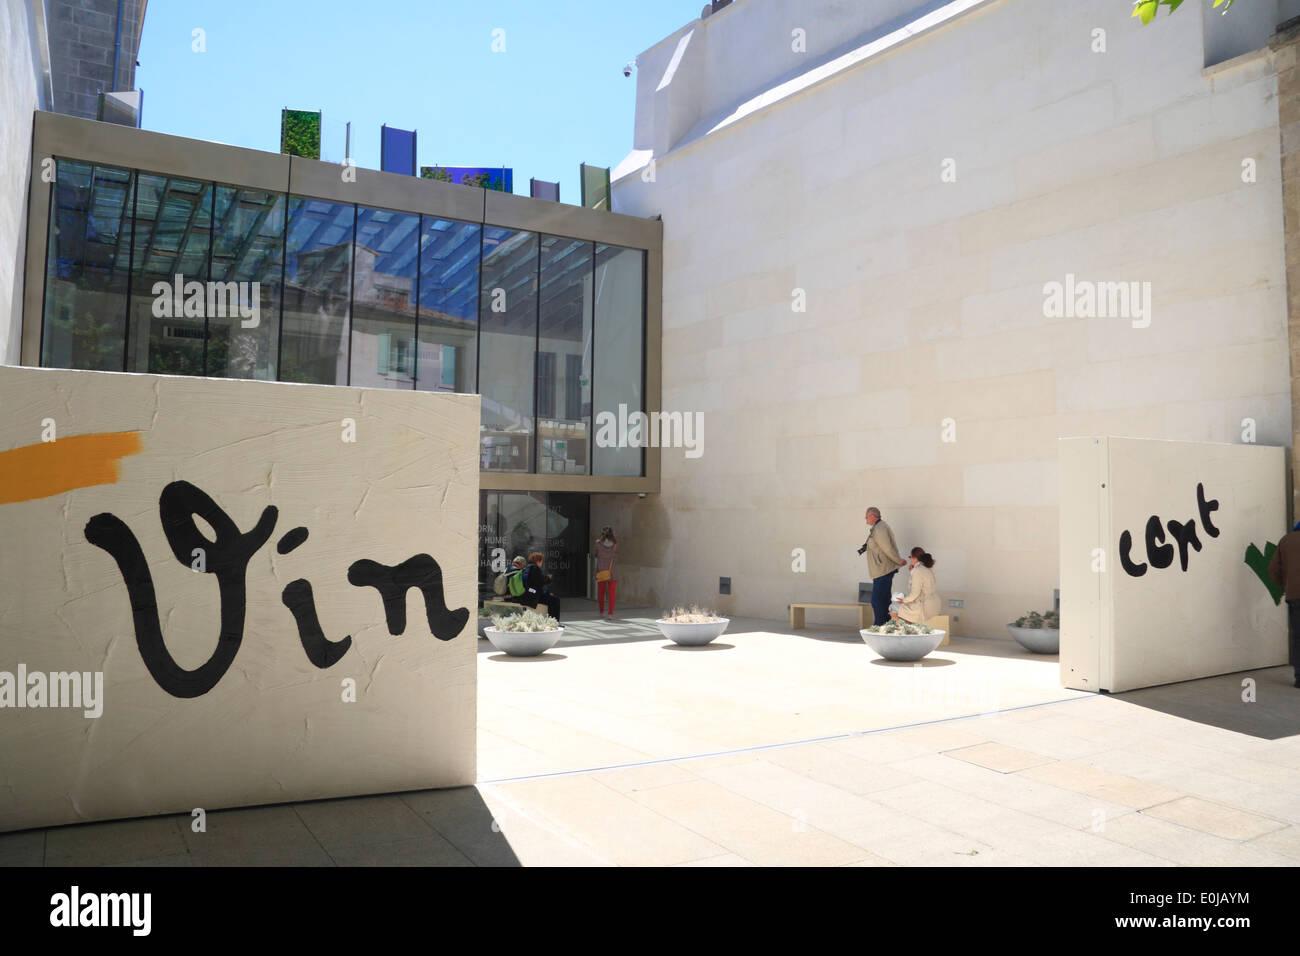 Entrance Fondatio Vincent van Gogh, Foundation, Arles, Camargue, Provence, France, Europe - Stock Image